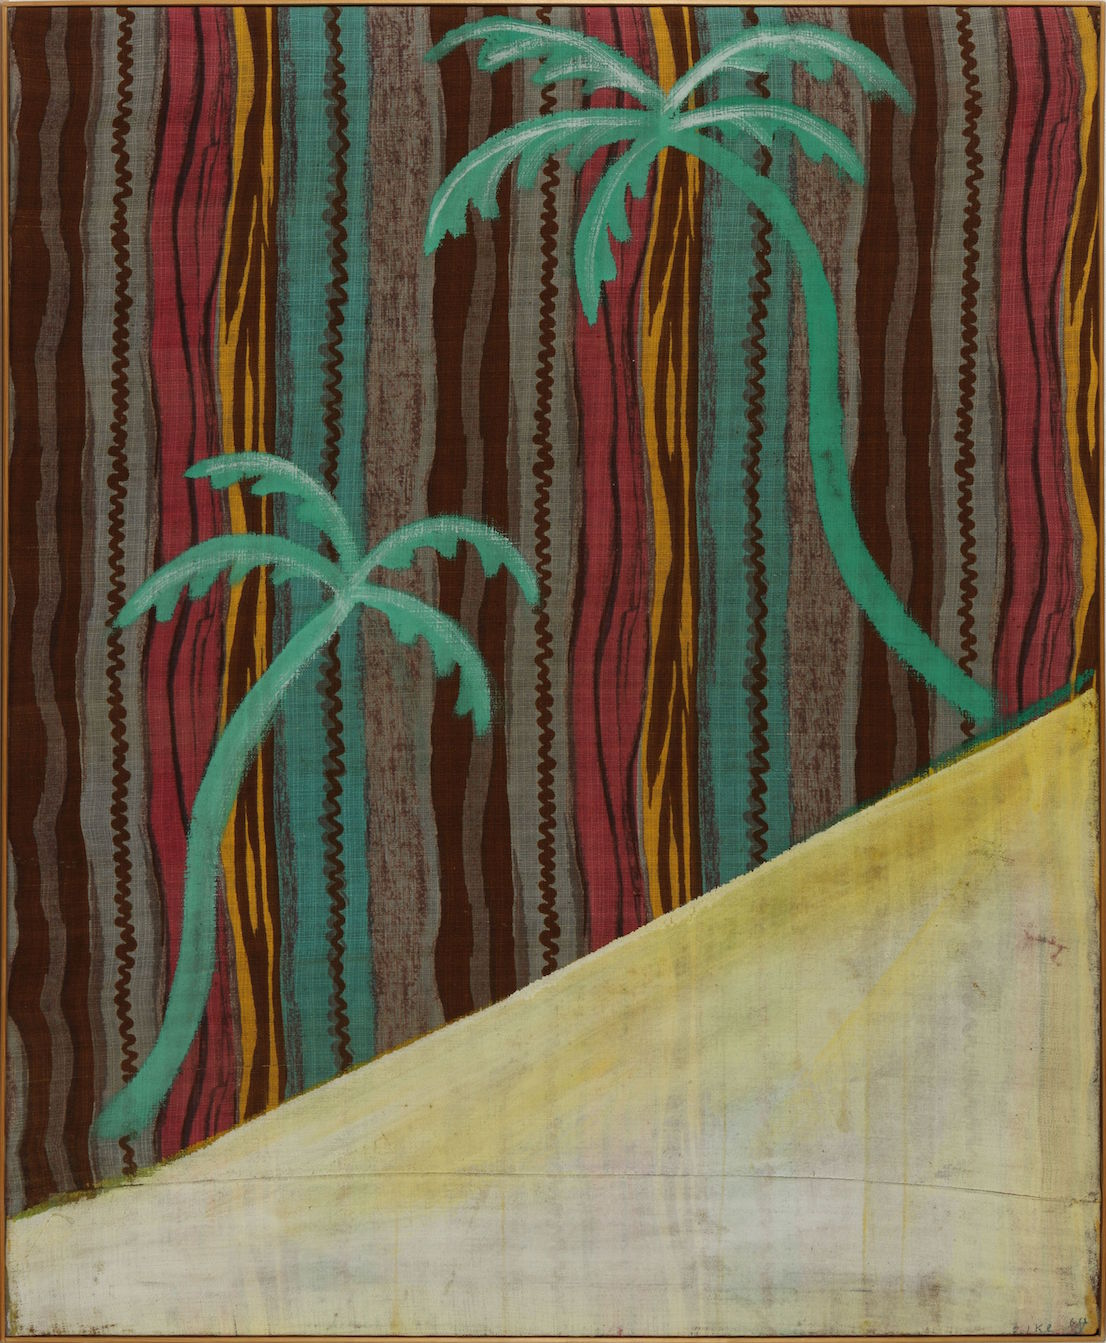 Sigmar Polke (1941 - 2010) The Palm Painting (Das Palmenbild) 1964 © The Estate of Sigmar Polke / DACS, London / VG Bild-Kunst, Bonn.